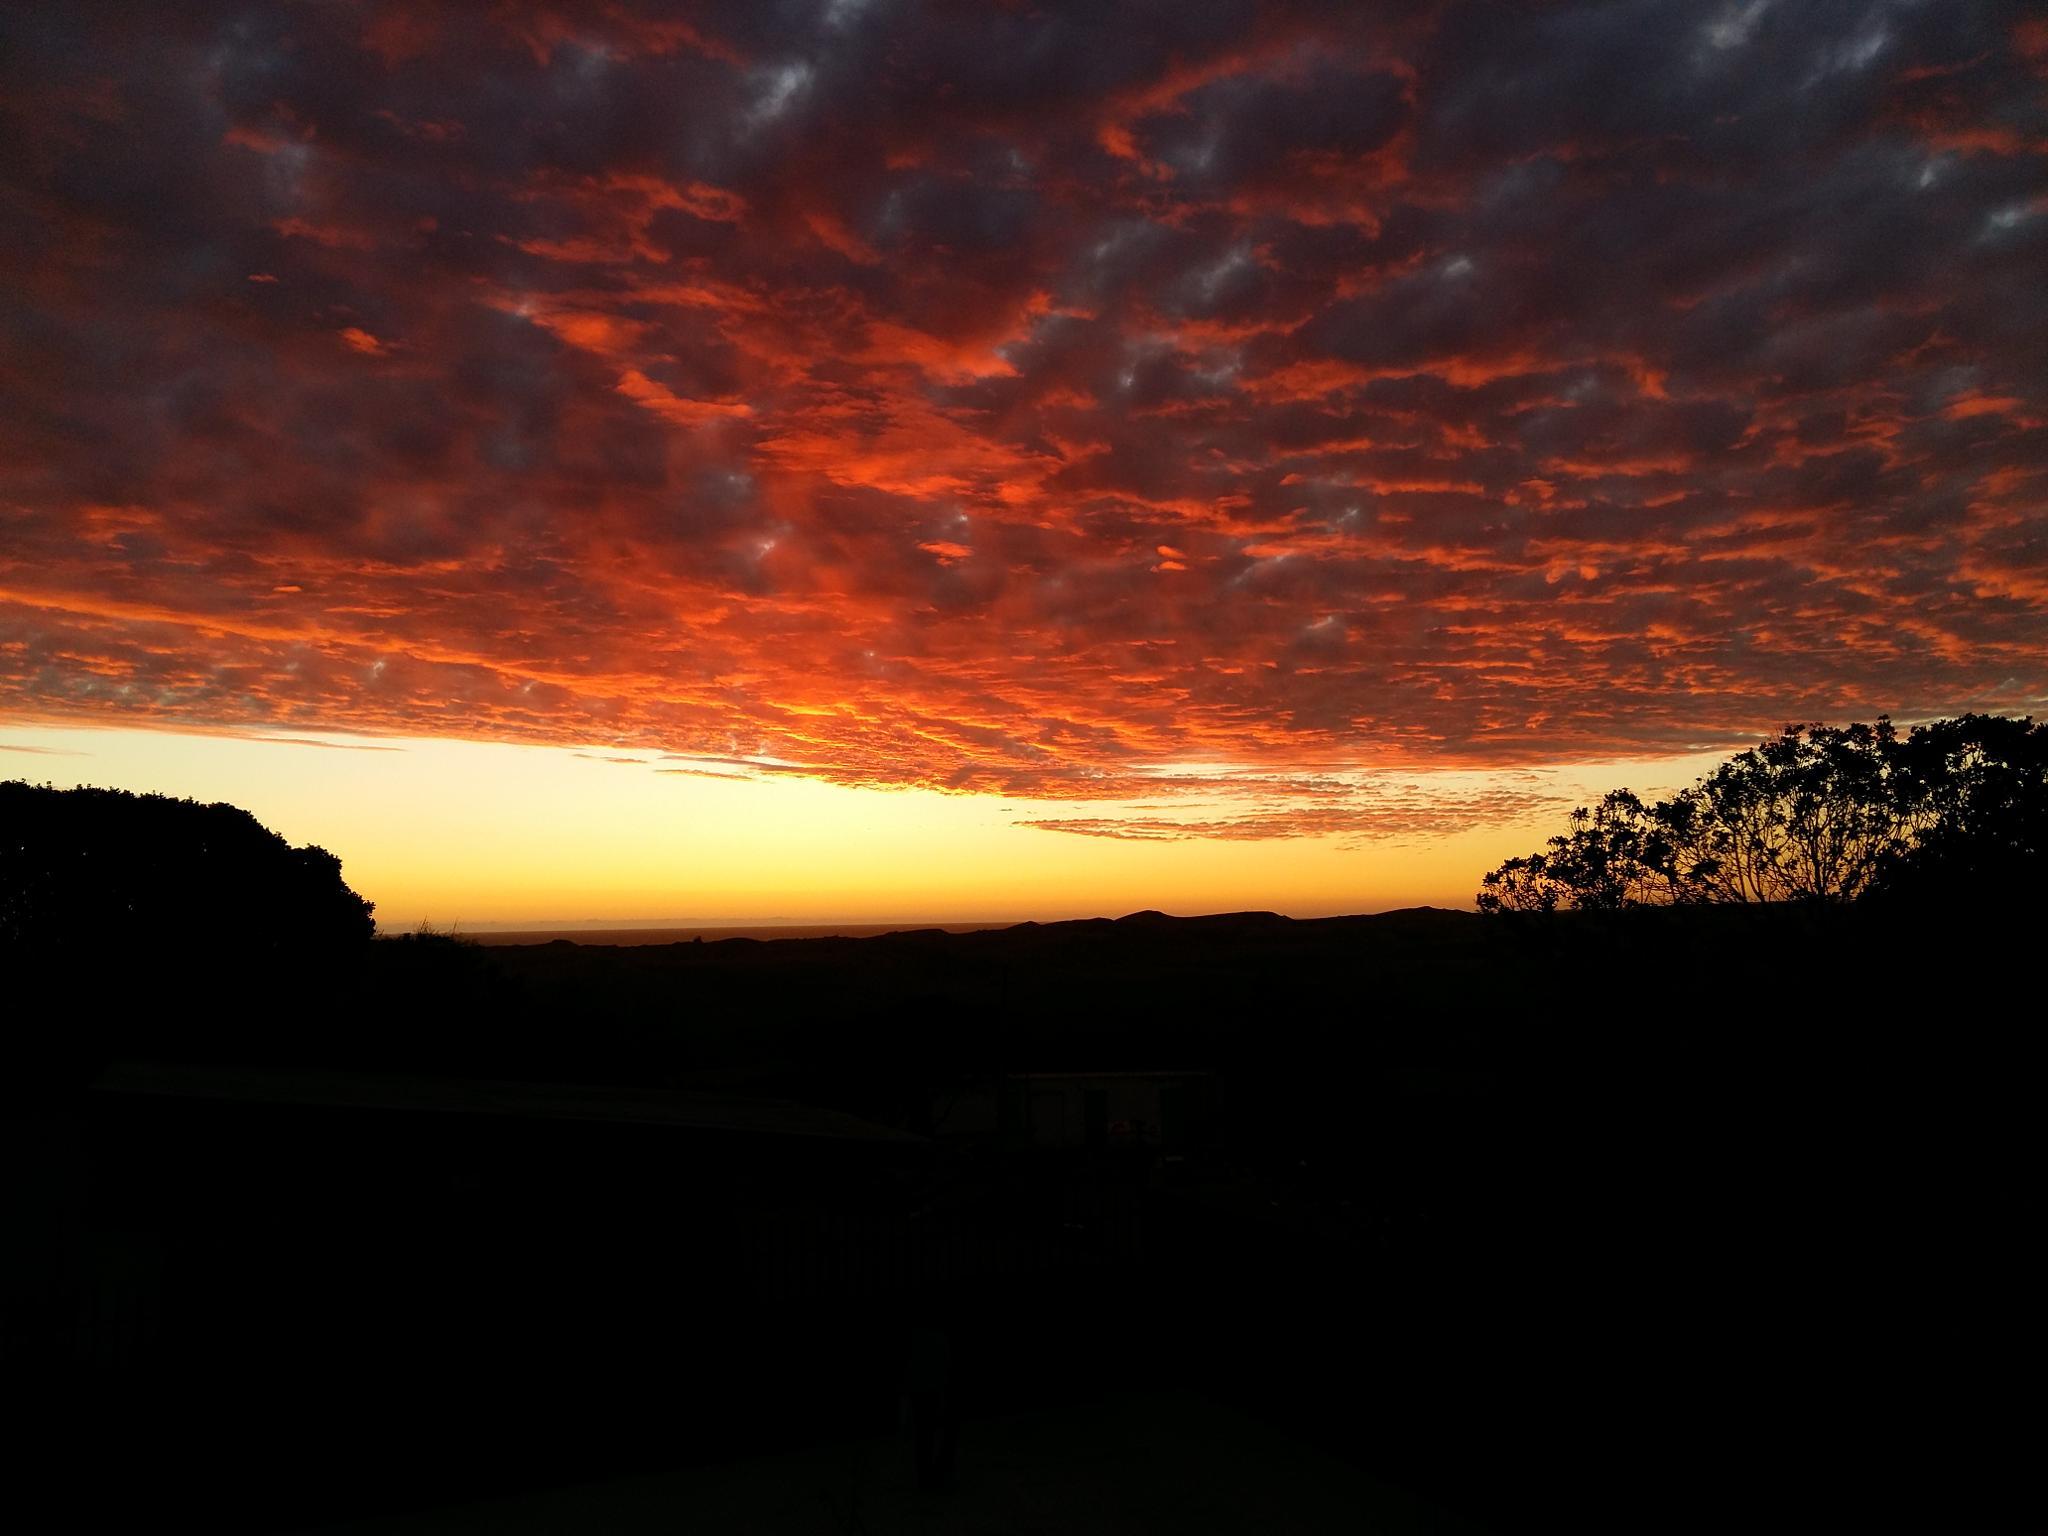 Sunset over pacific ocean by Tor Johansen